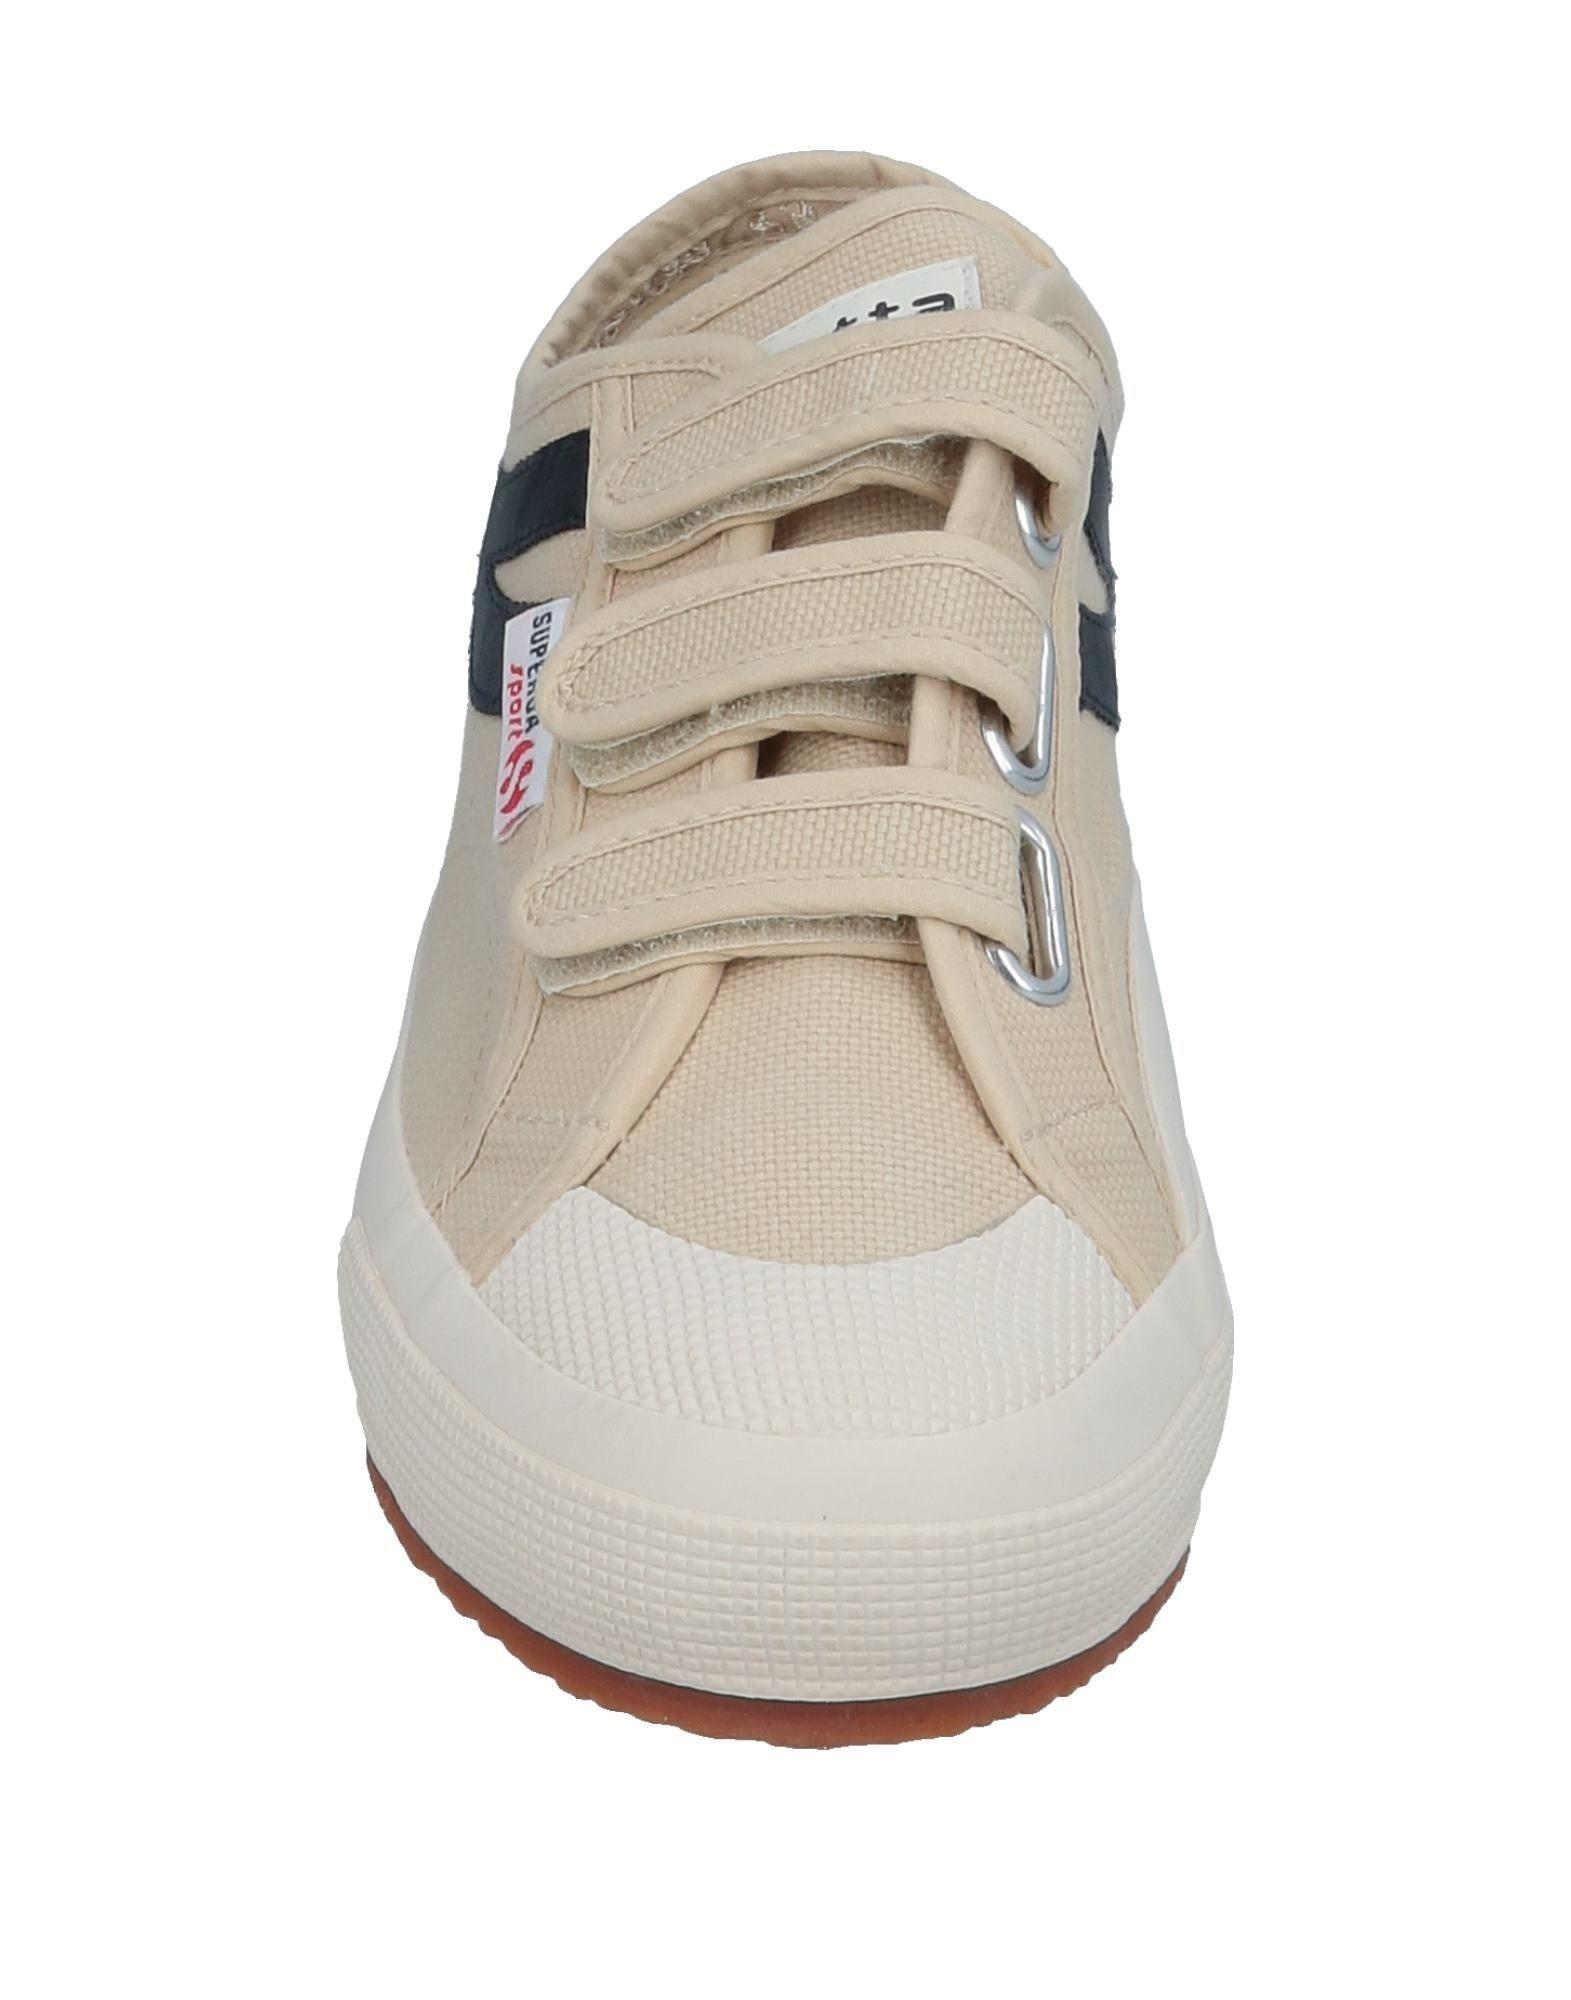 Superga® Preis-Leistungs-Verhältnis, Sneakers Damen Gutes Preis-Leistungs-Verhältnis, Superga® es lohnt sich de4286